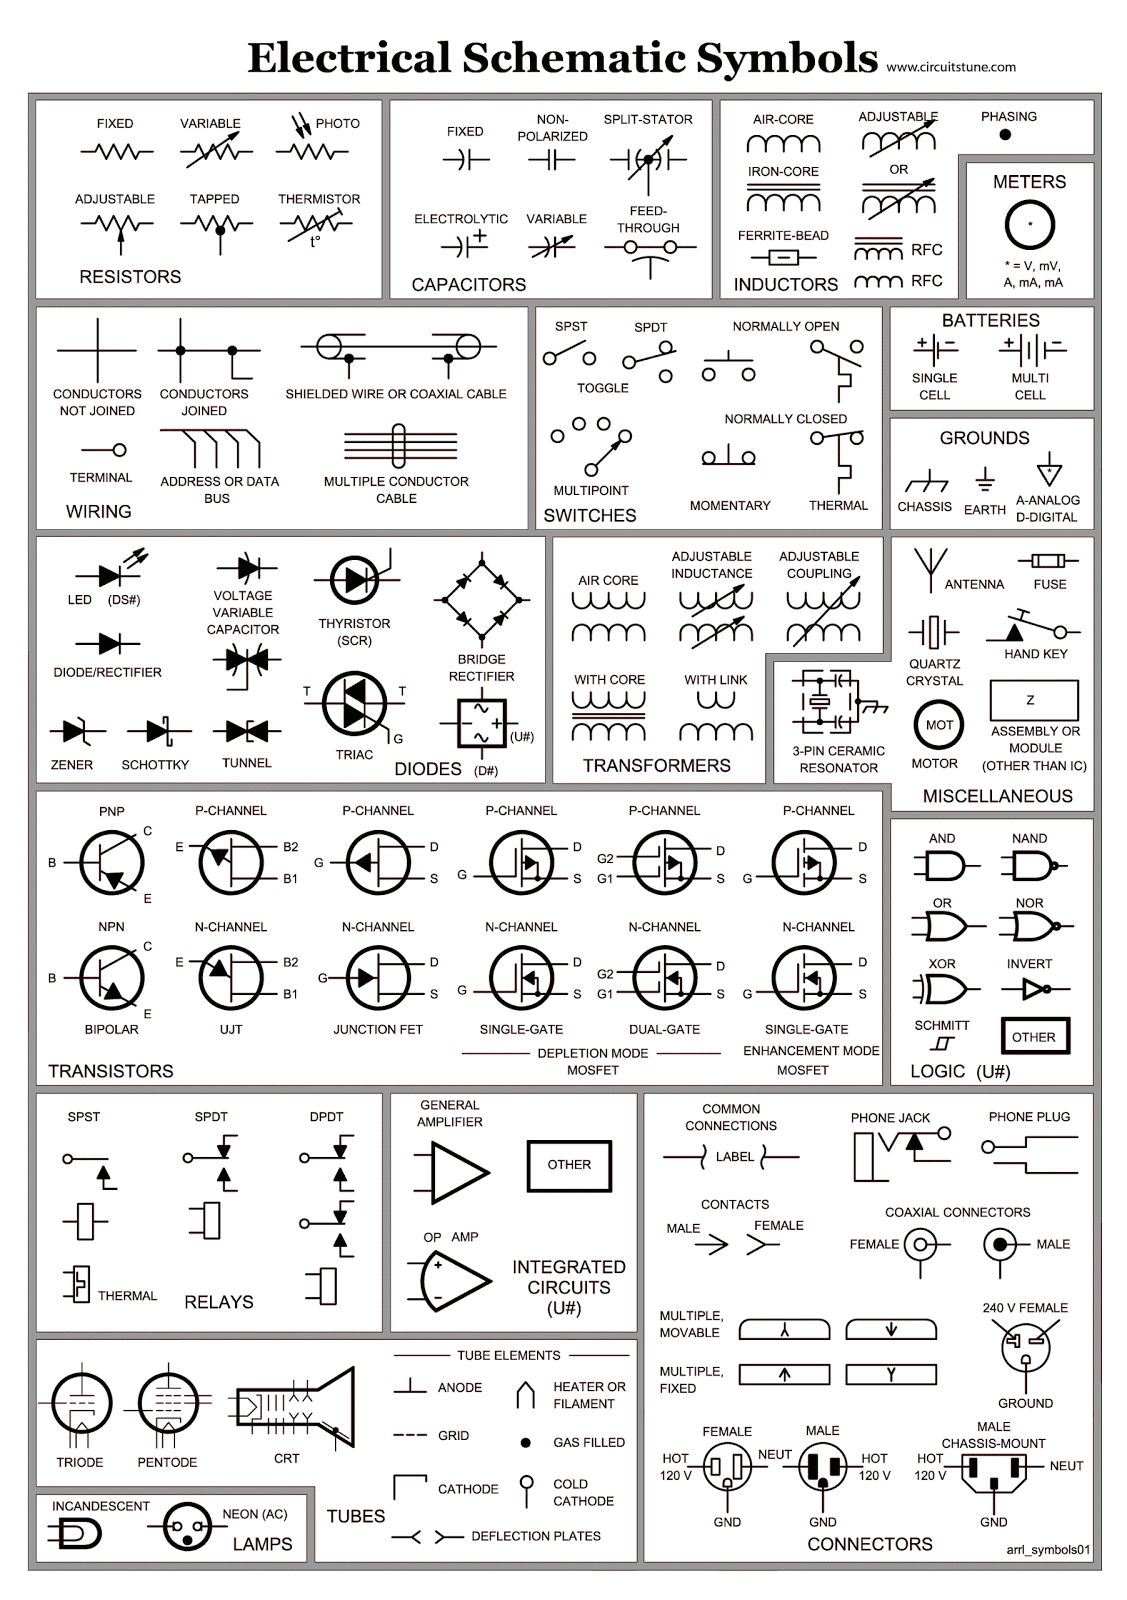 Electrical Schematic Symbols ~ CircuitsTune